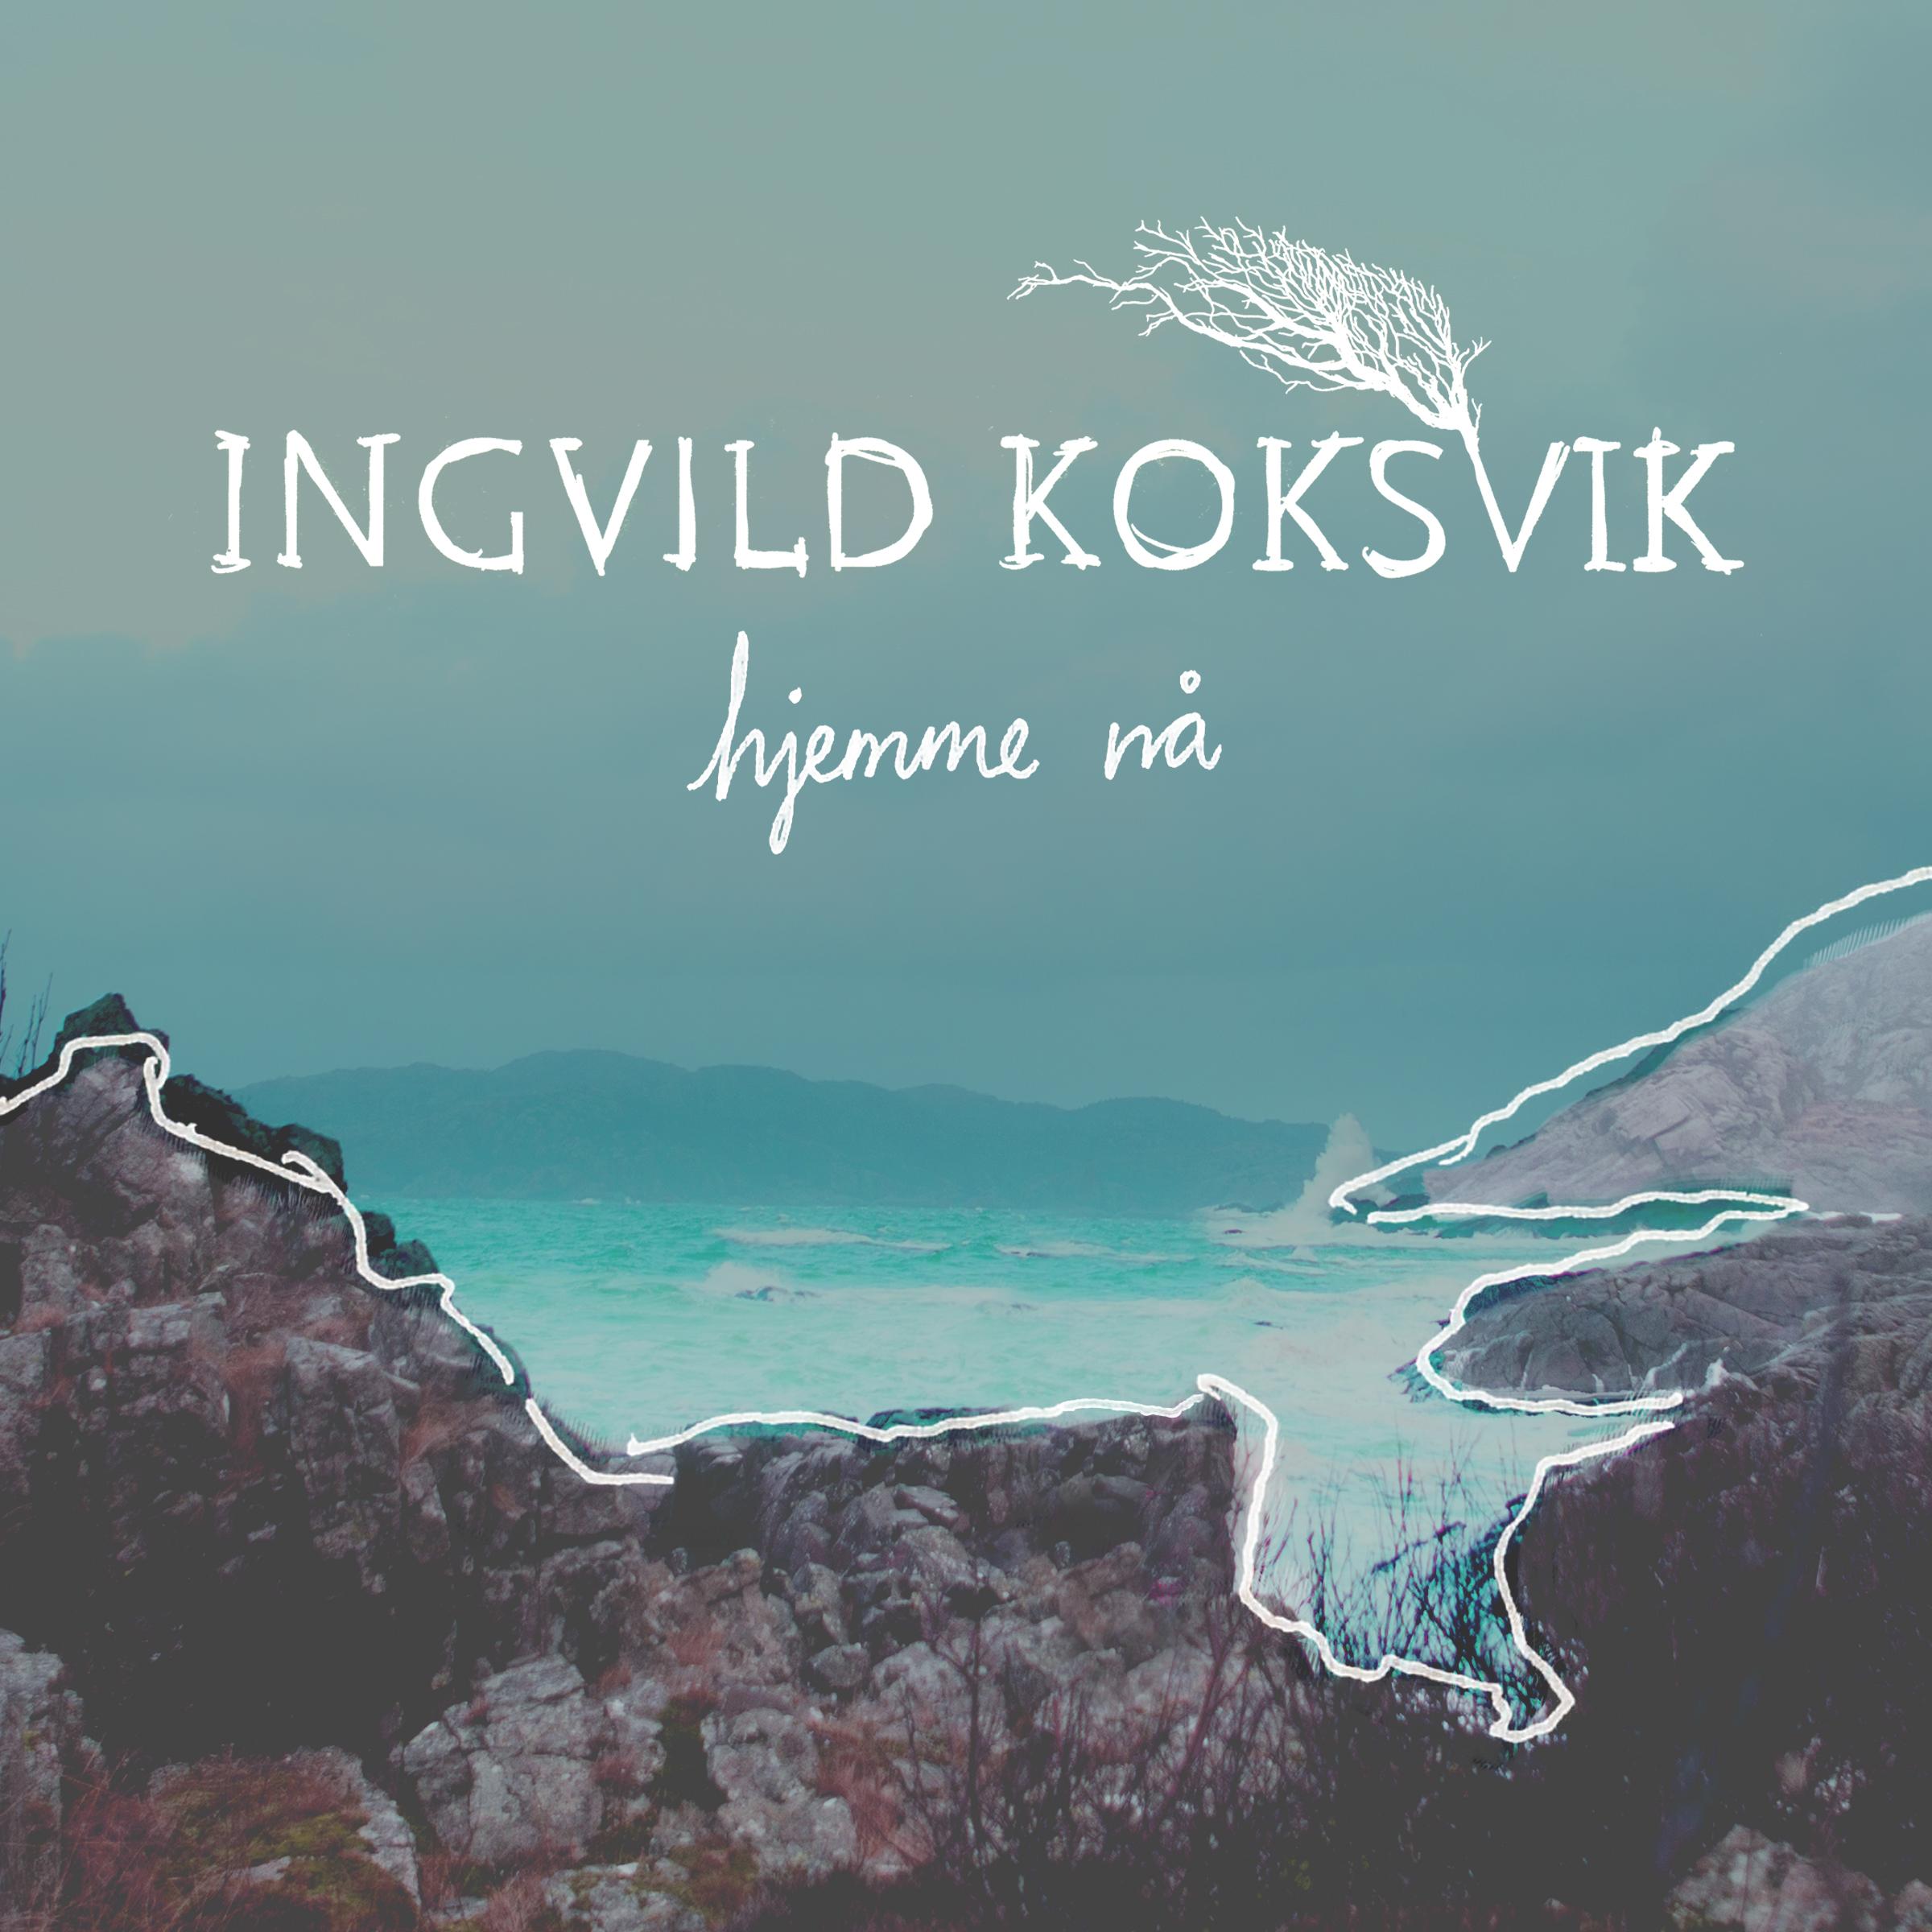 Hjemme nå (single) - Ingvild Koksvik